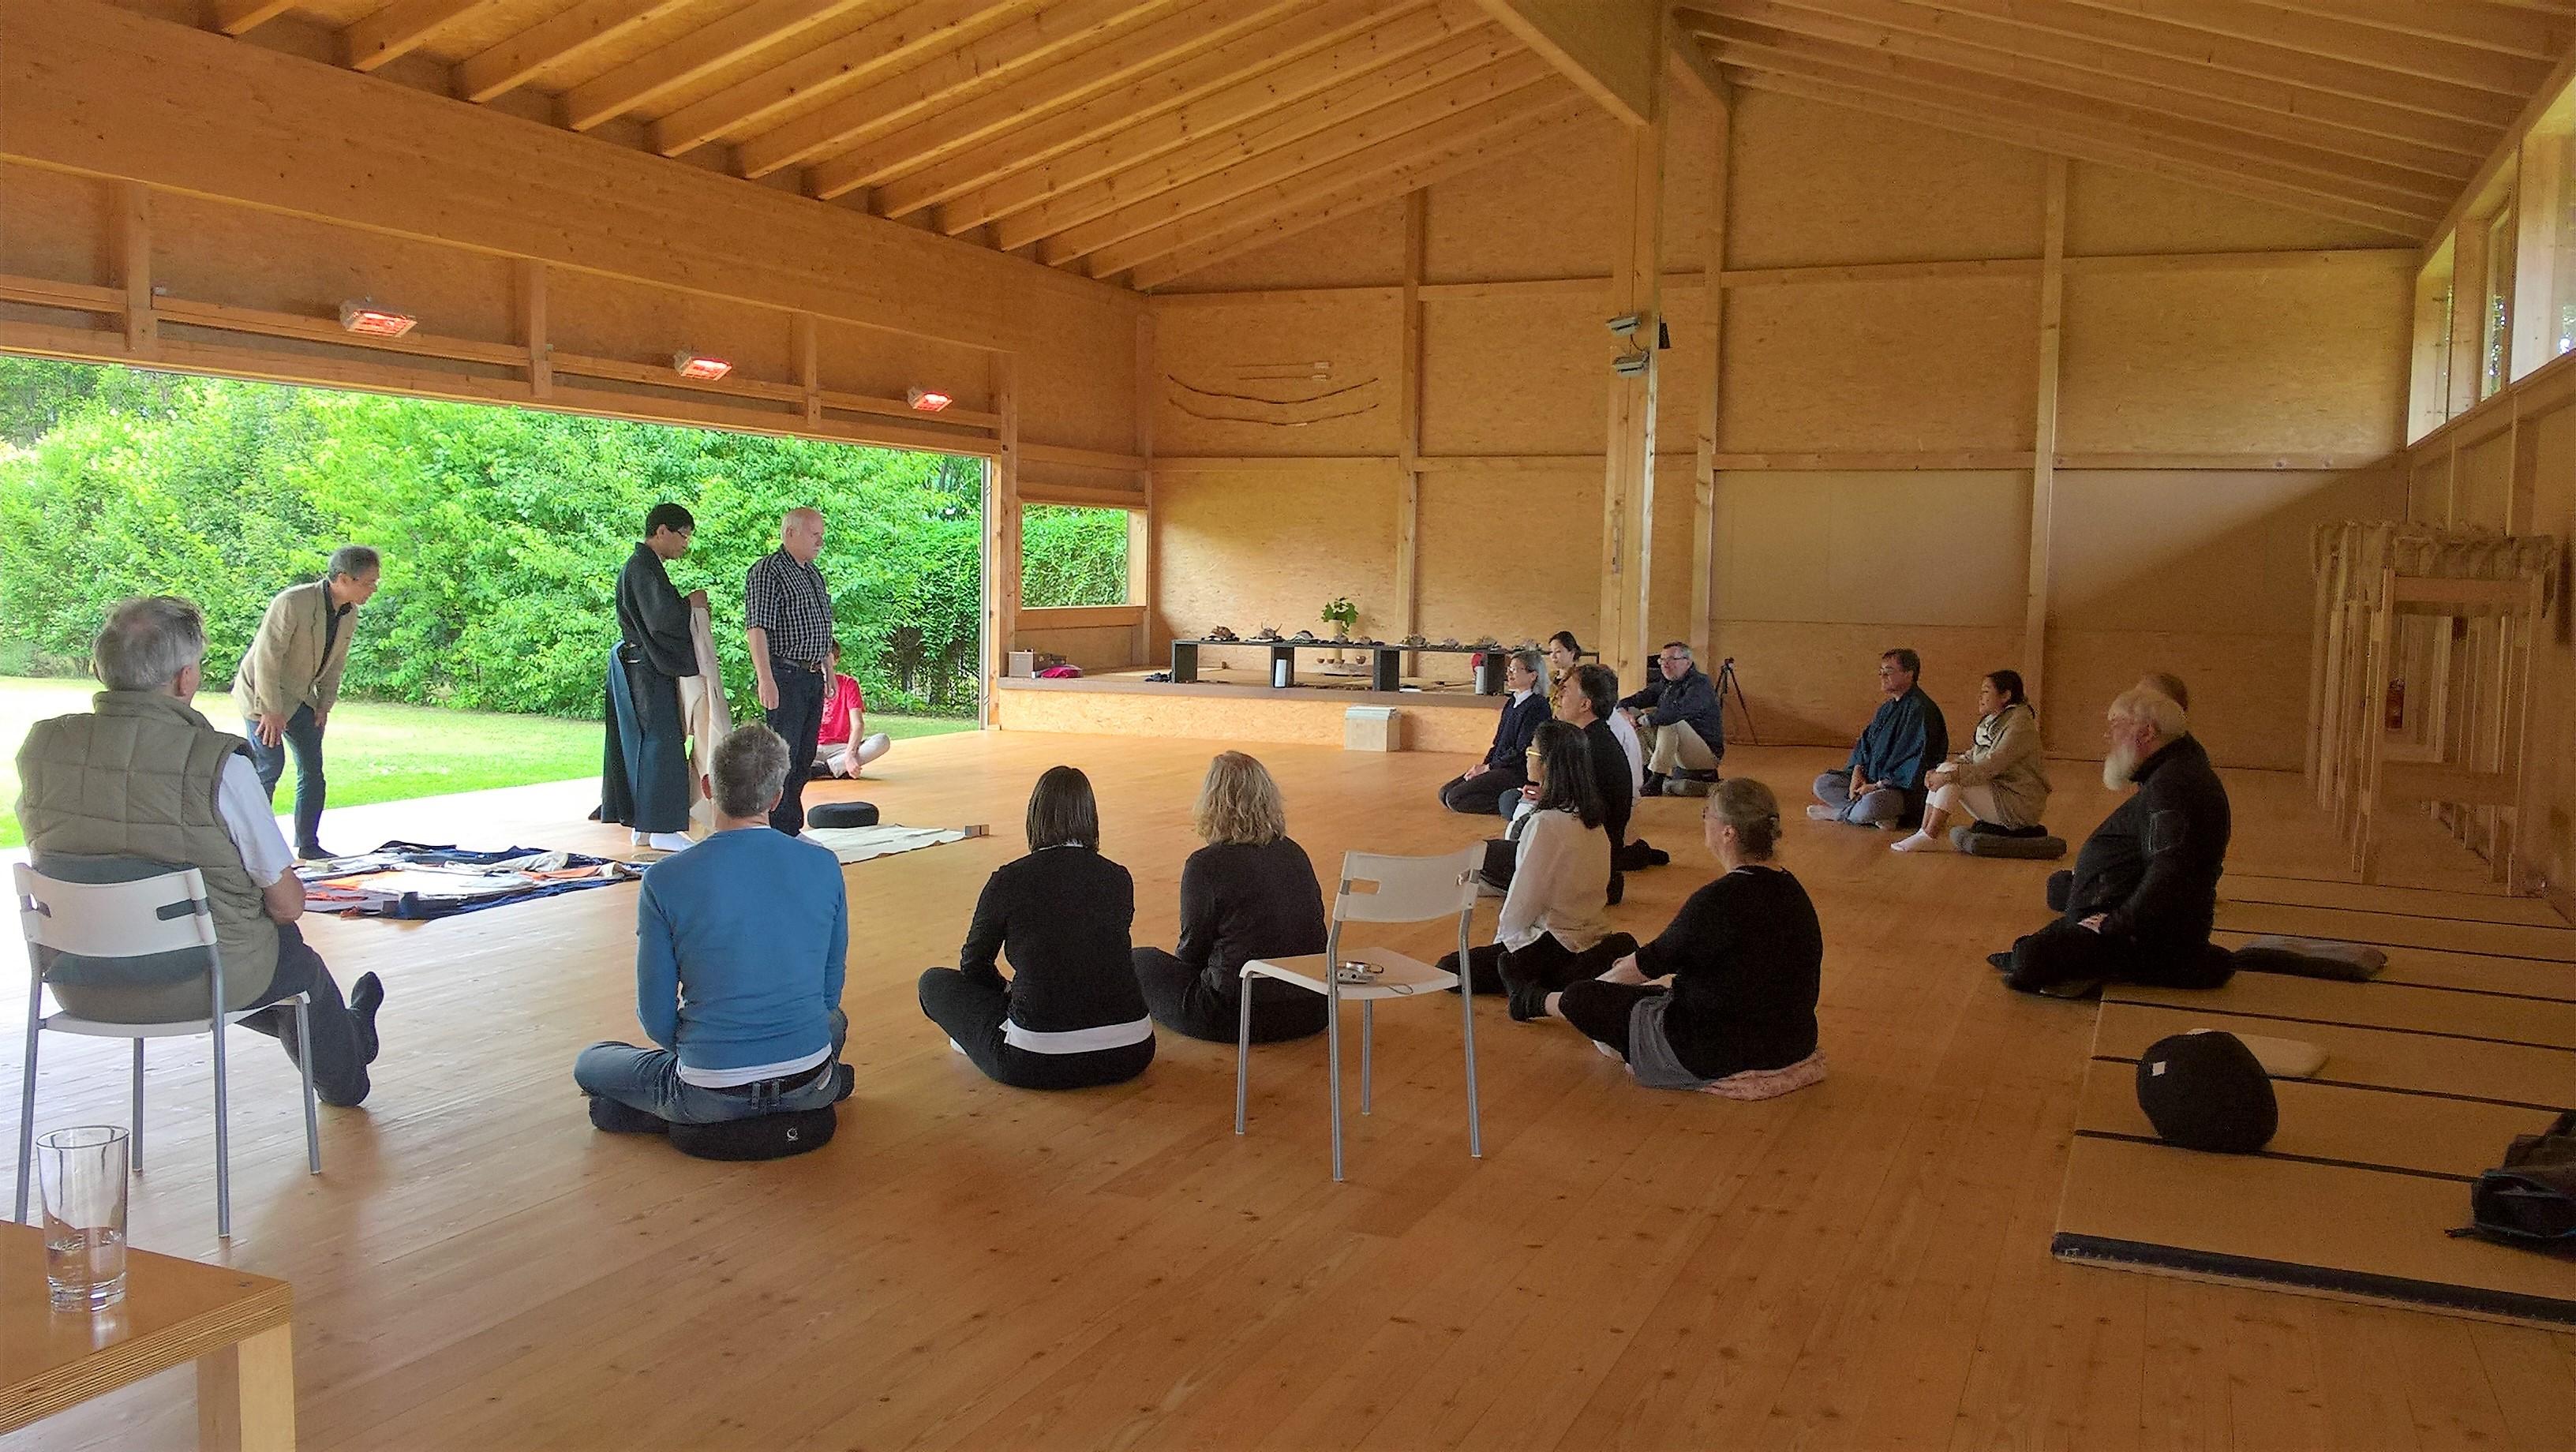 2017.06.17, WienerBerg Kyudojo, Noh Seminar 010